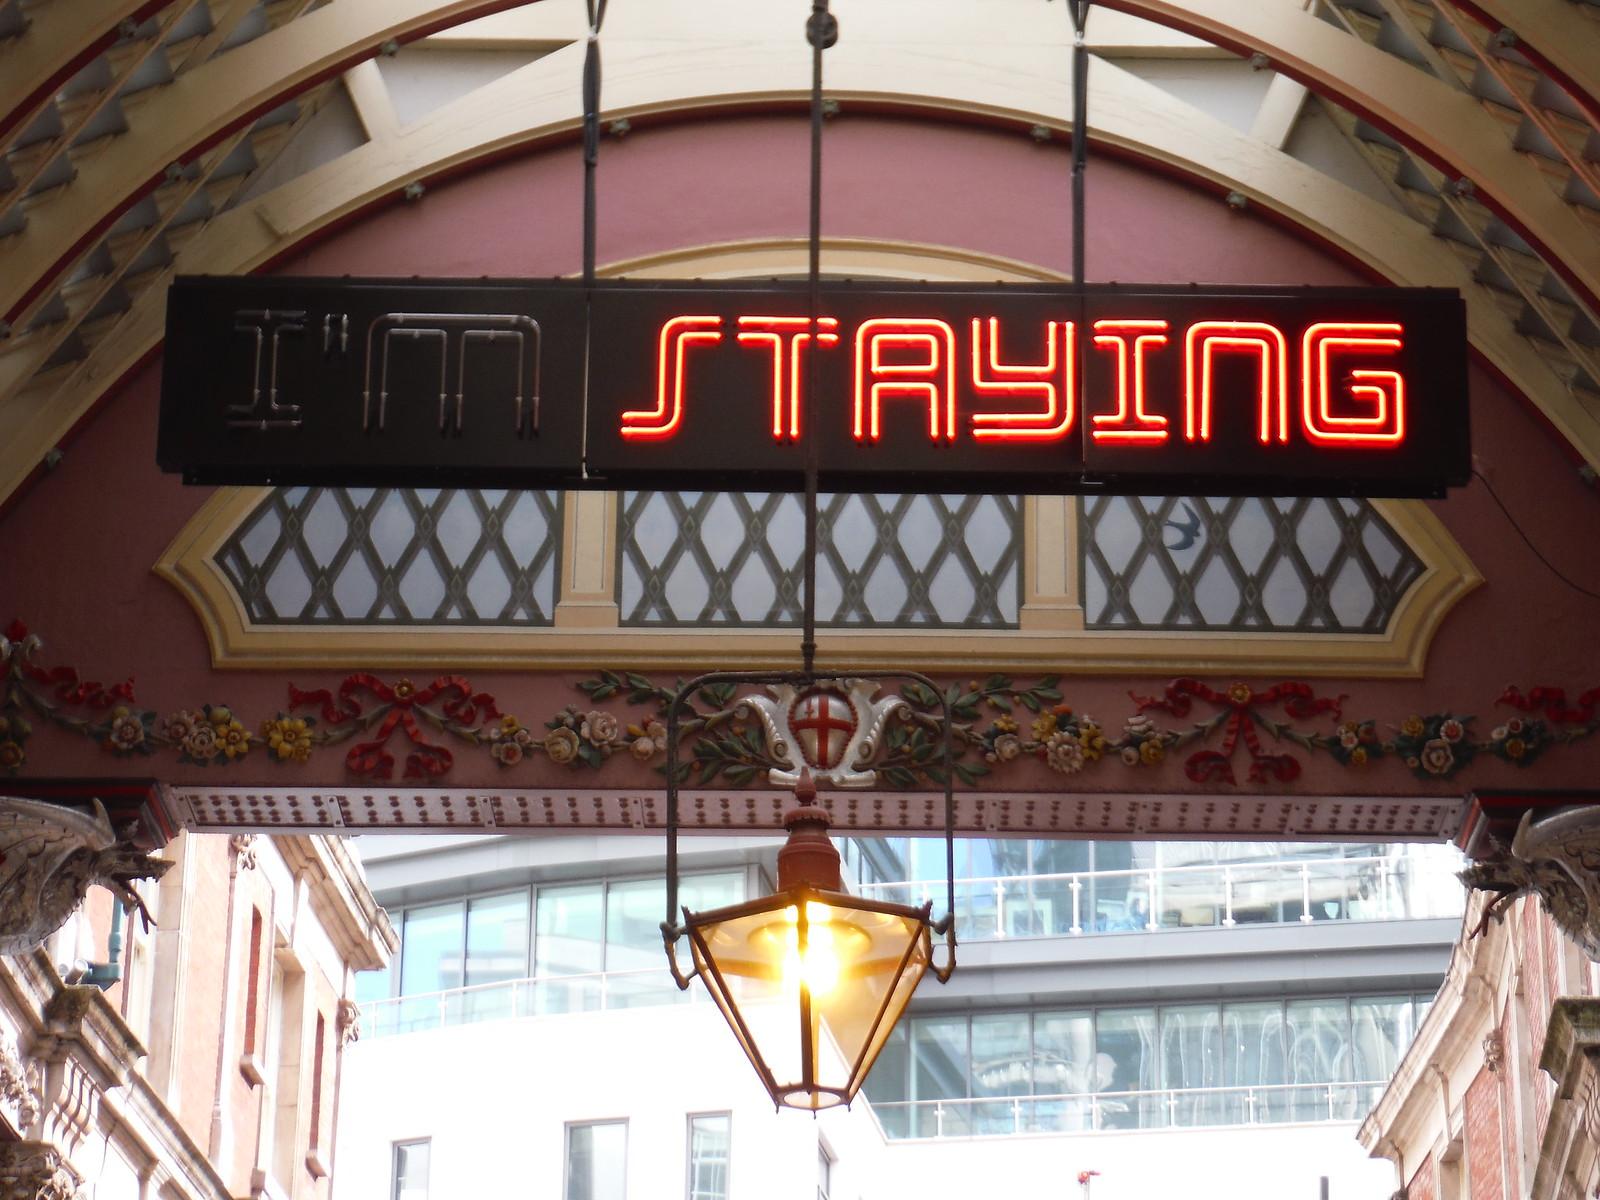 Shaun C. Badham - I'm Staying SWC Walk Short 24 - Sculpture in the City